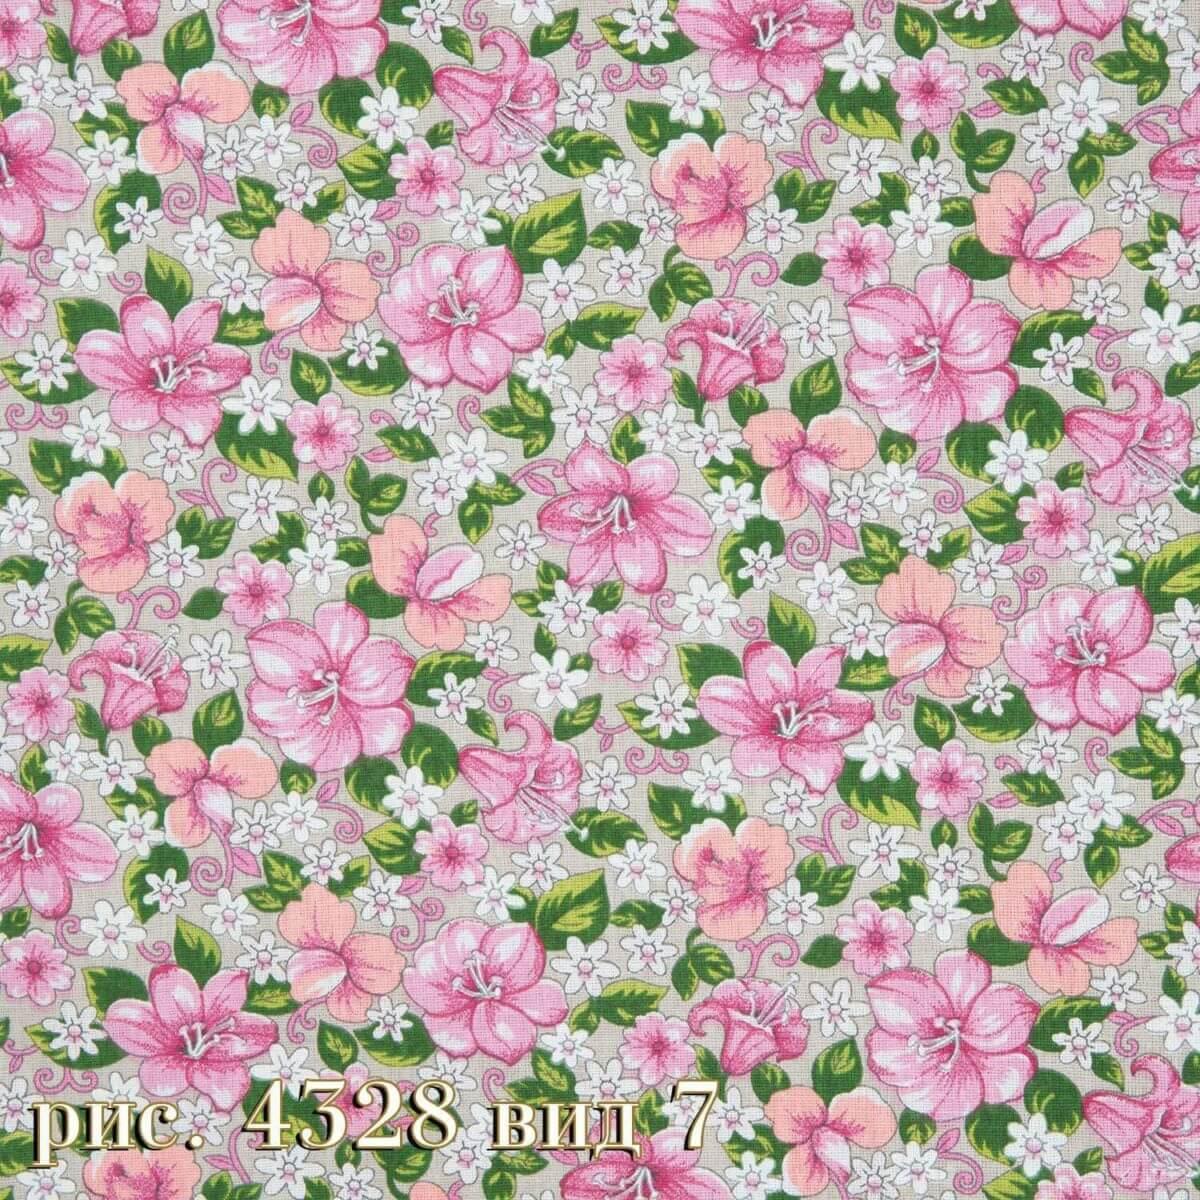 Фото 20 - Плательная ткань бязь 150 см (4328/6) Под заказ.